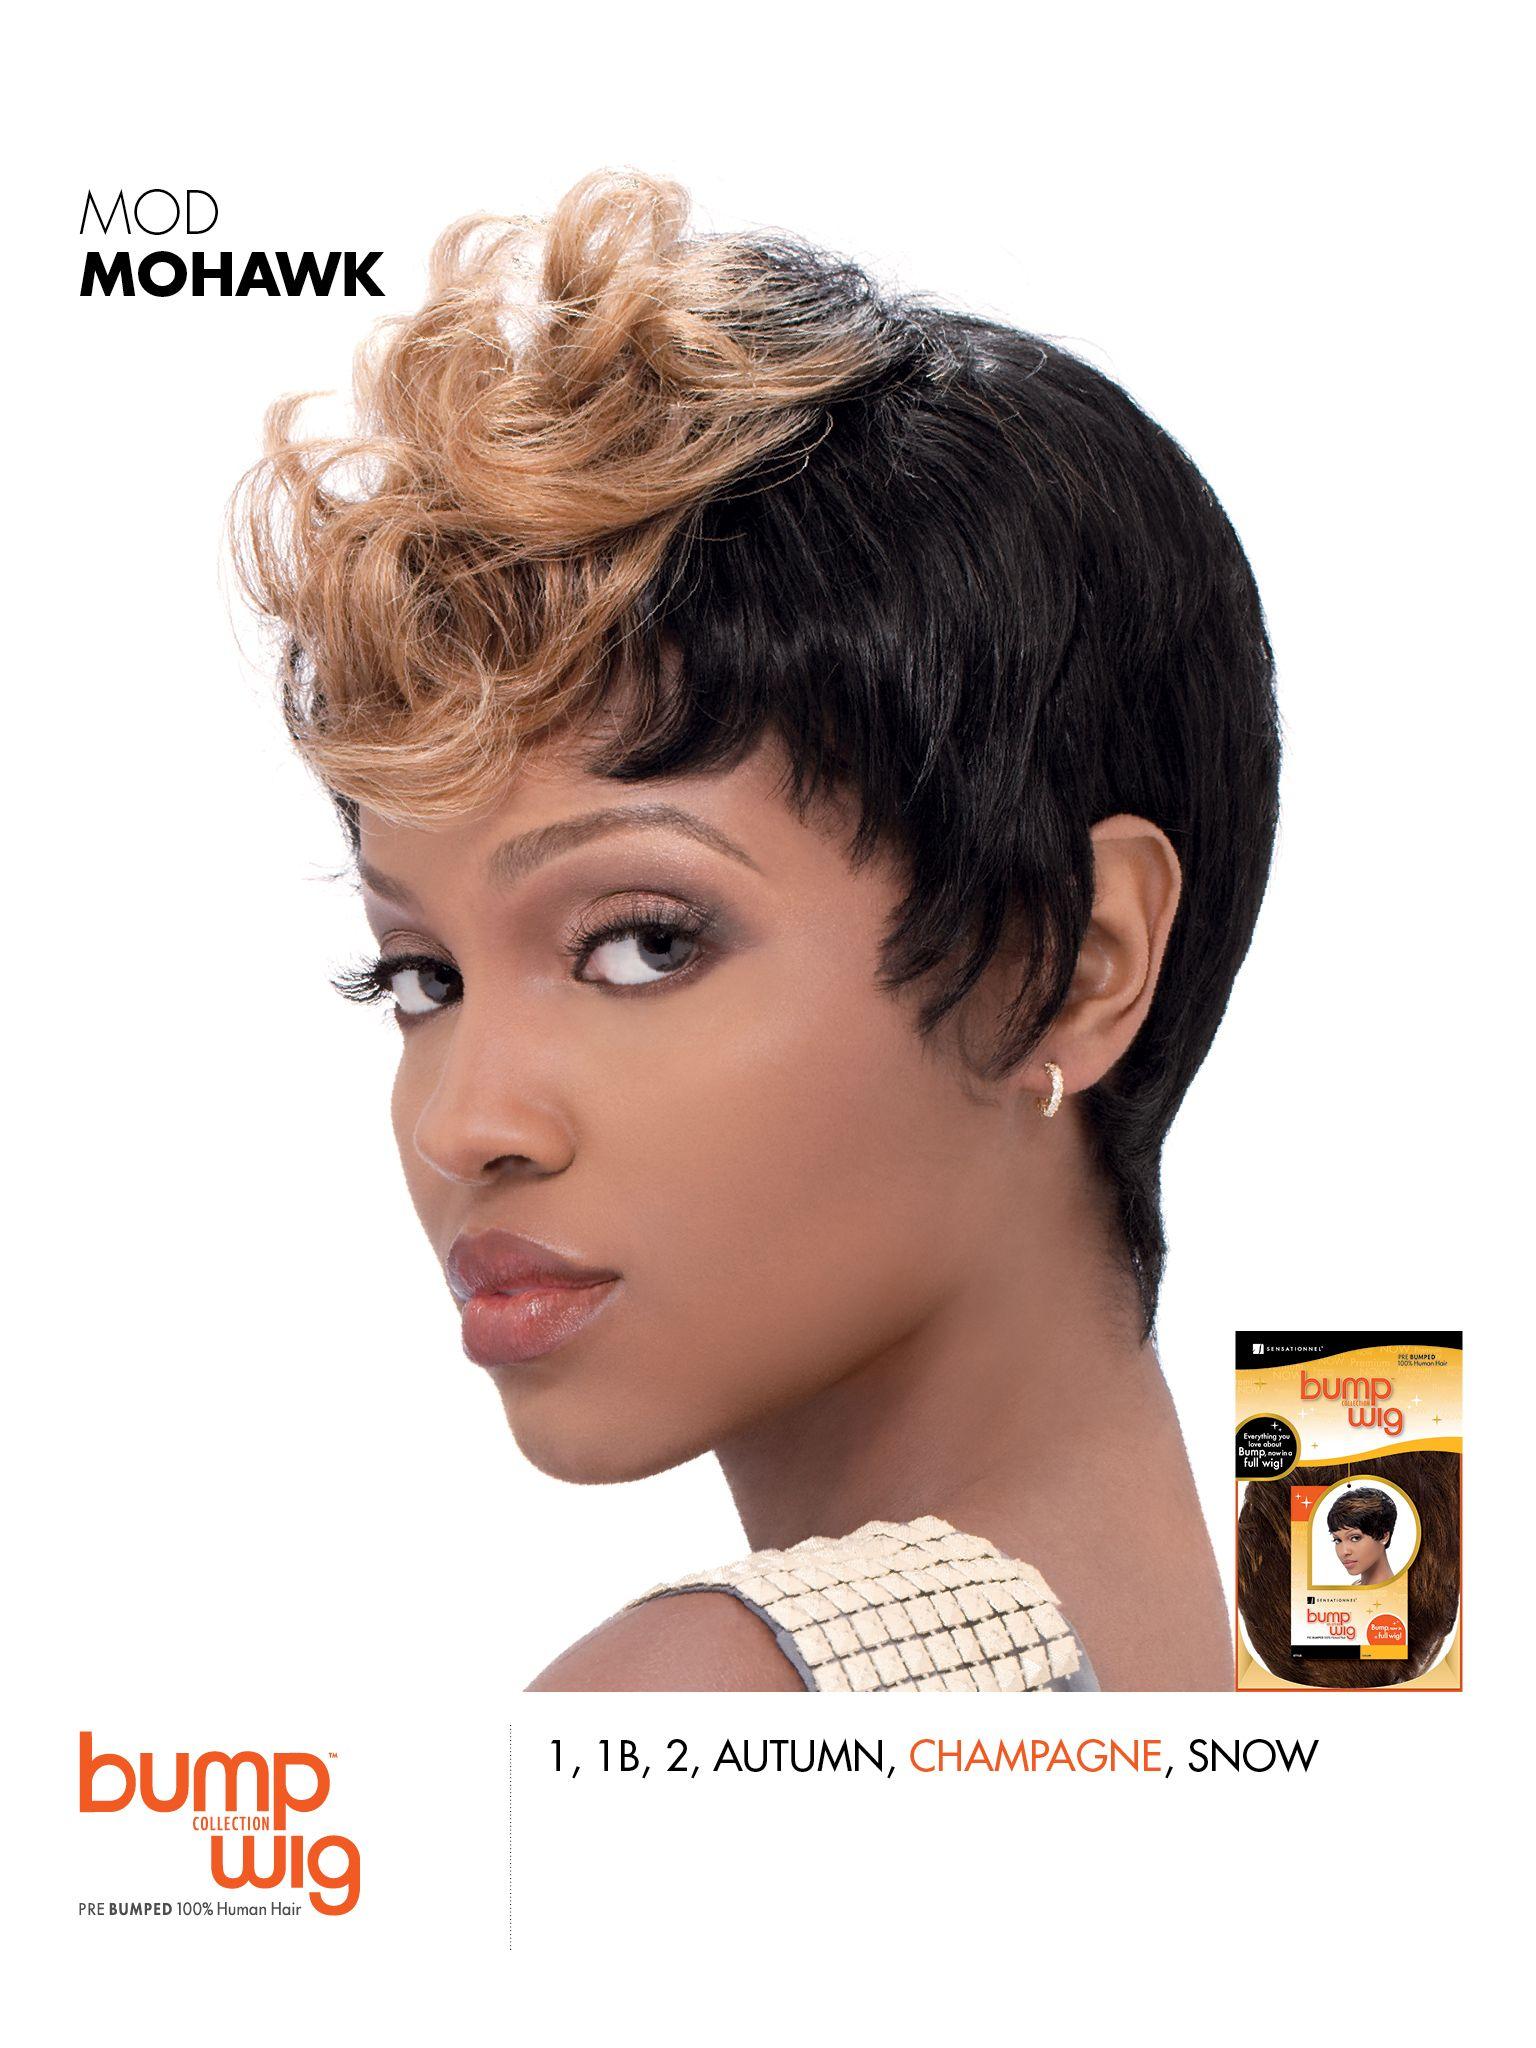 Mod Mohawk Pre Bumped 100 Human Hair Sensationnel Wig Bumpwig